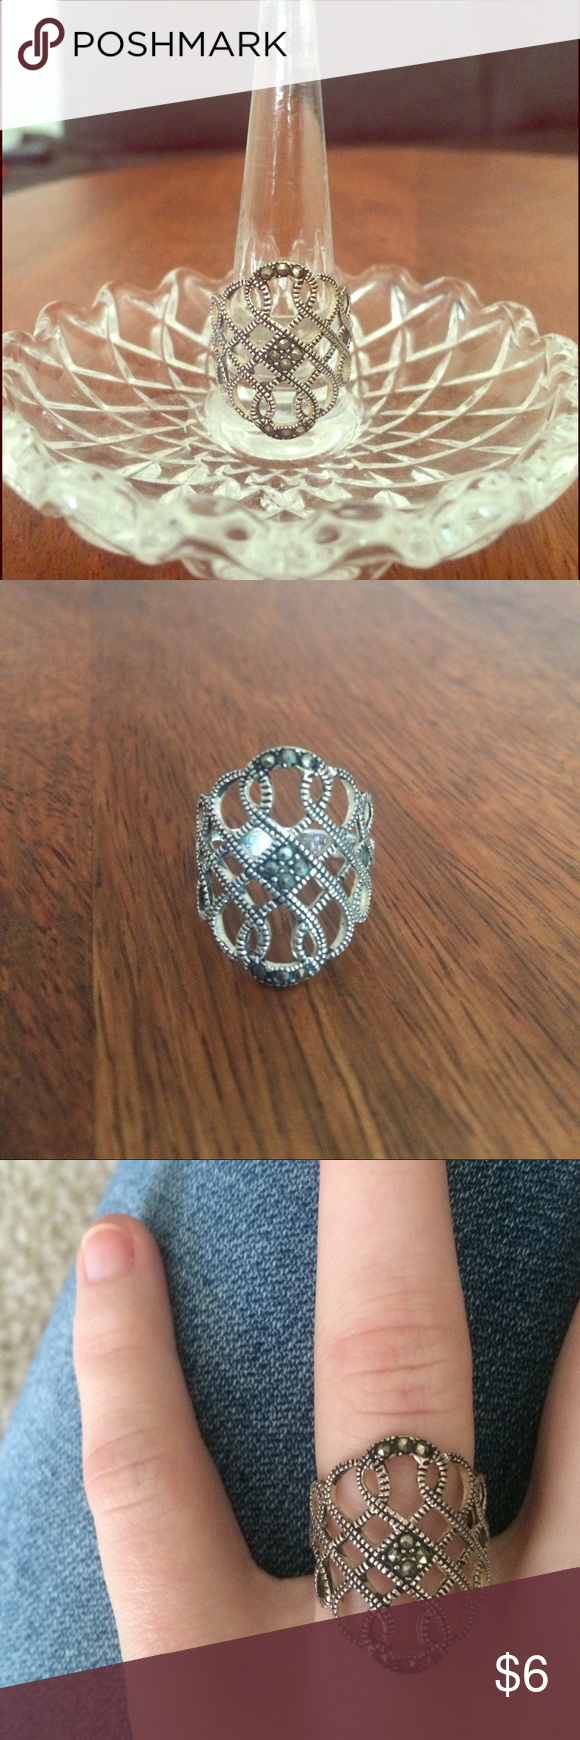 American Eagle Scroll Ring American Eagle Scroll Ring in size 7. American Eagle Outfitters Jewelry Rings